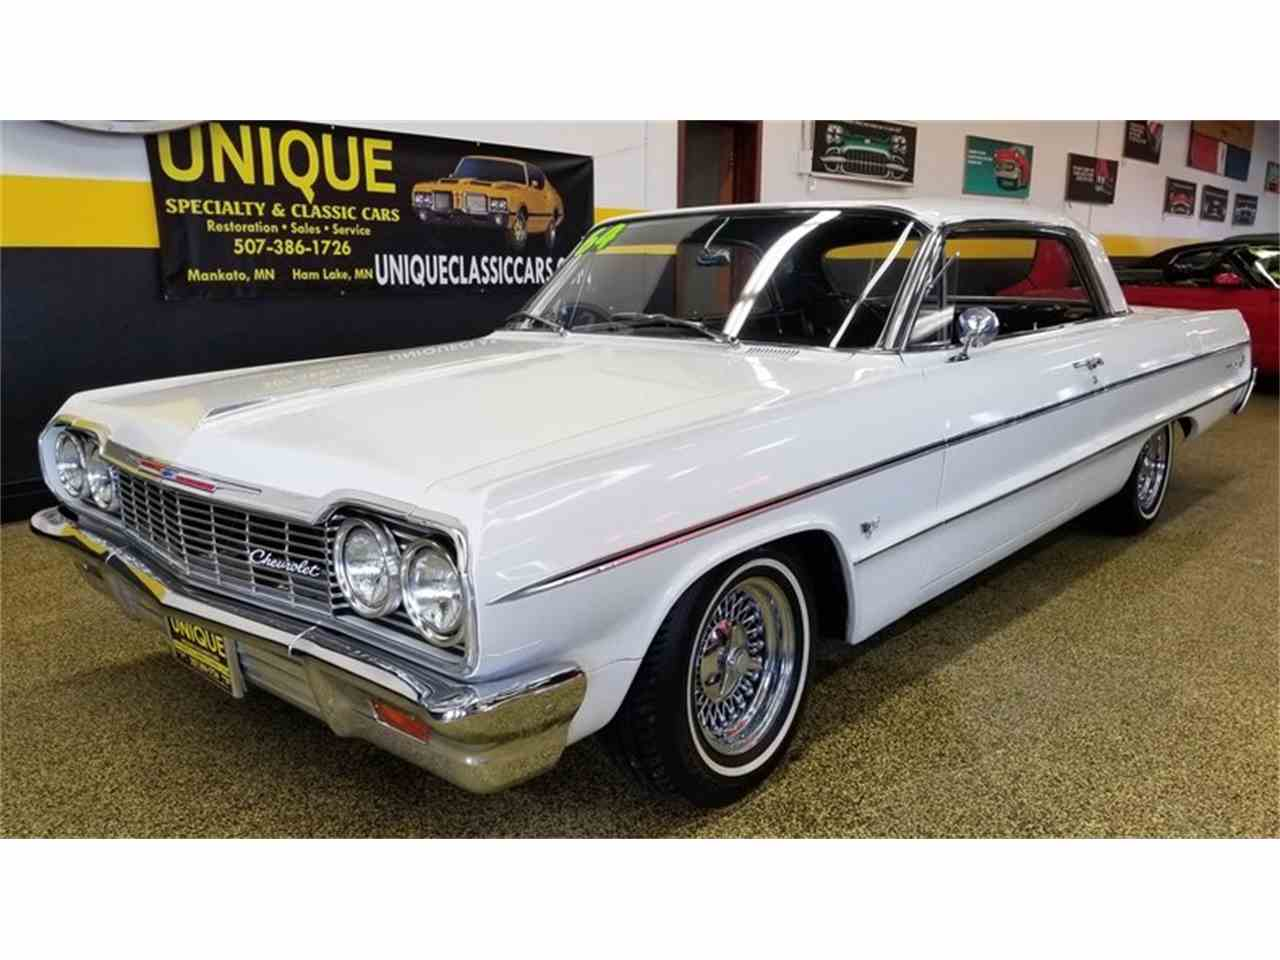 1964 Chevrolet Impala 2 door hard top for Sale | ClassicCars.com ...